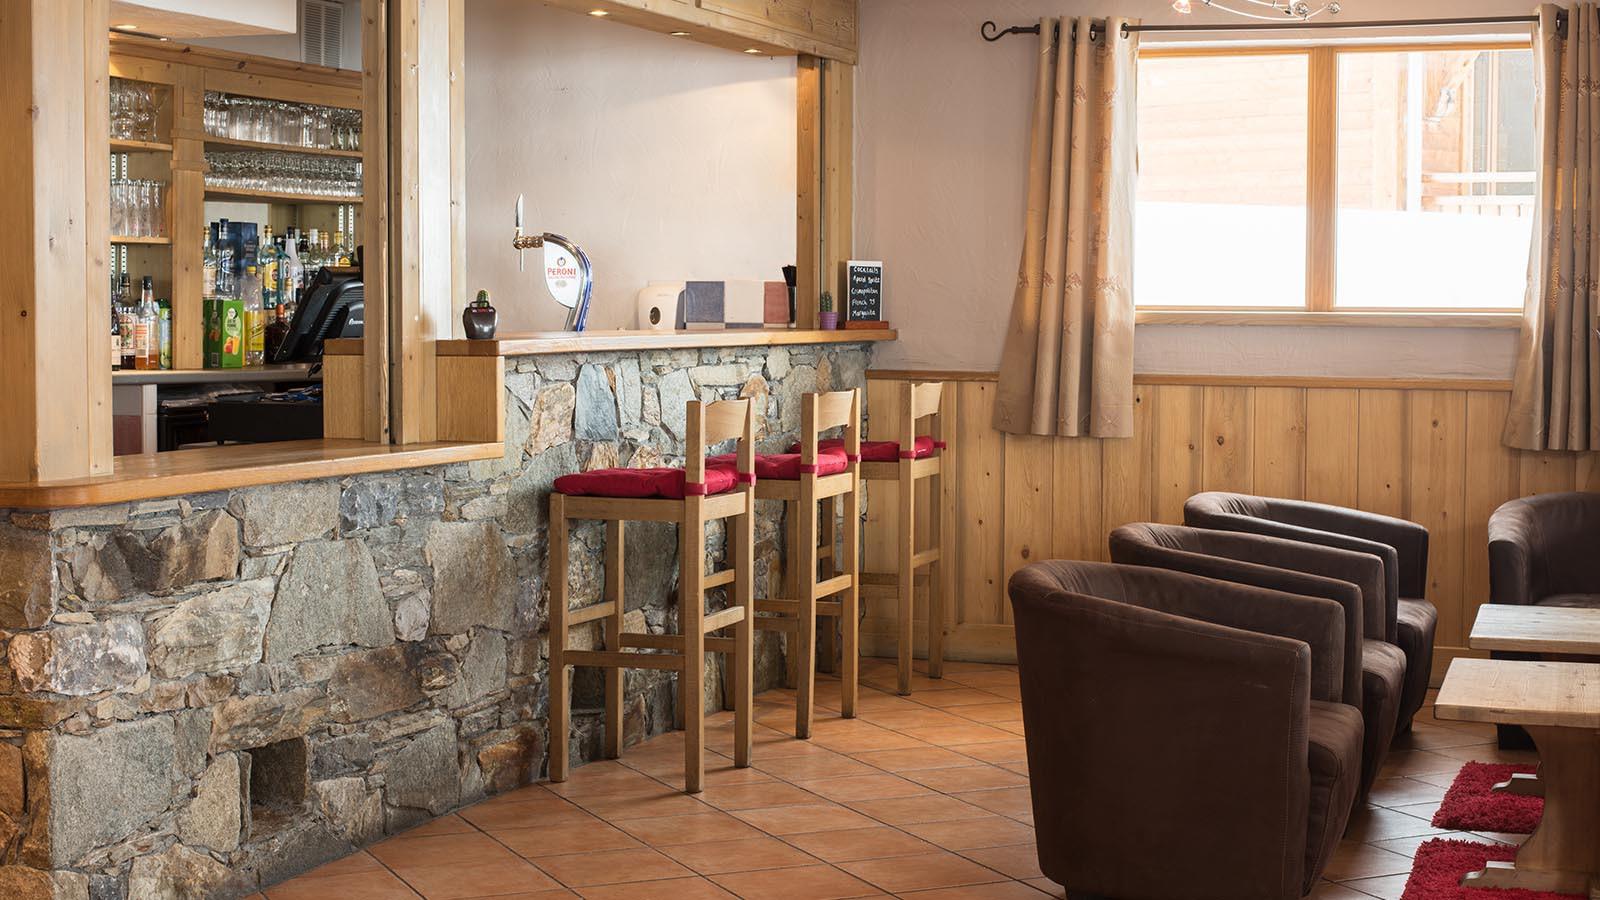 Bar in the Ski Lodge Aigle, Tignes, France